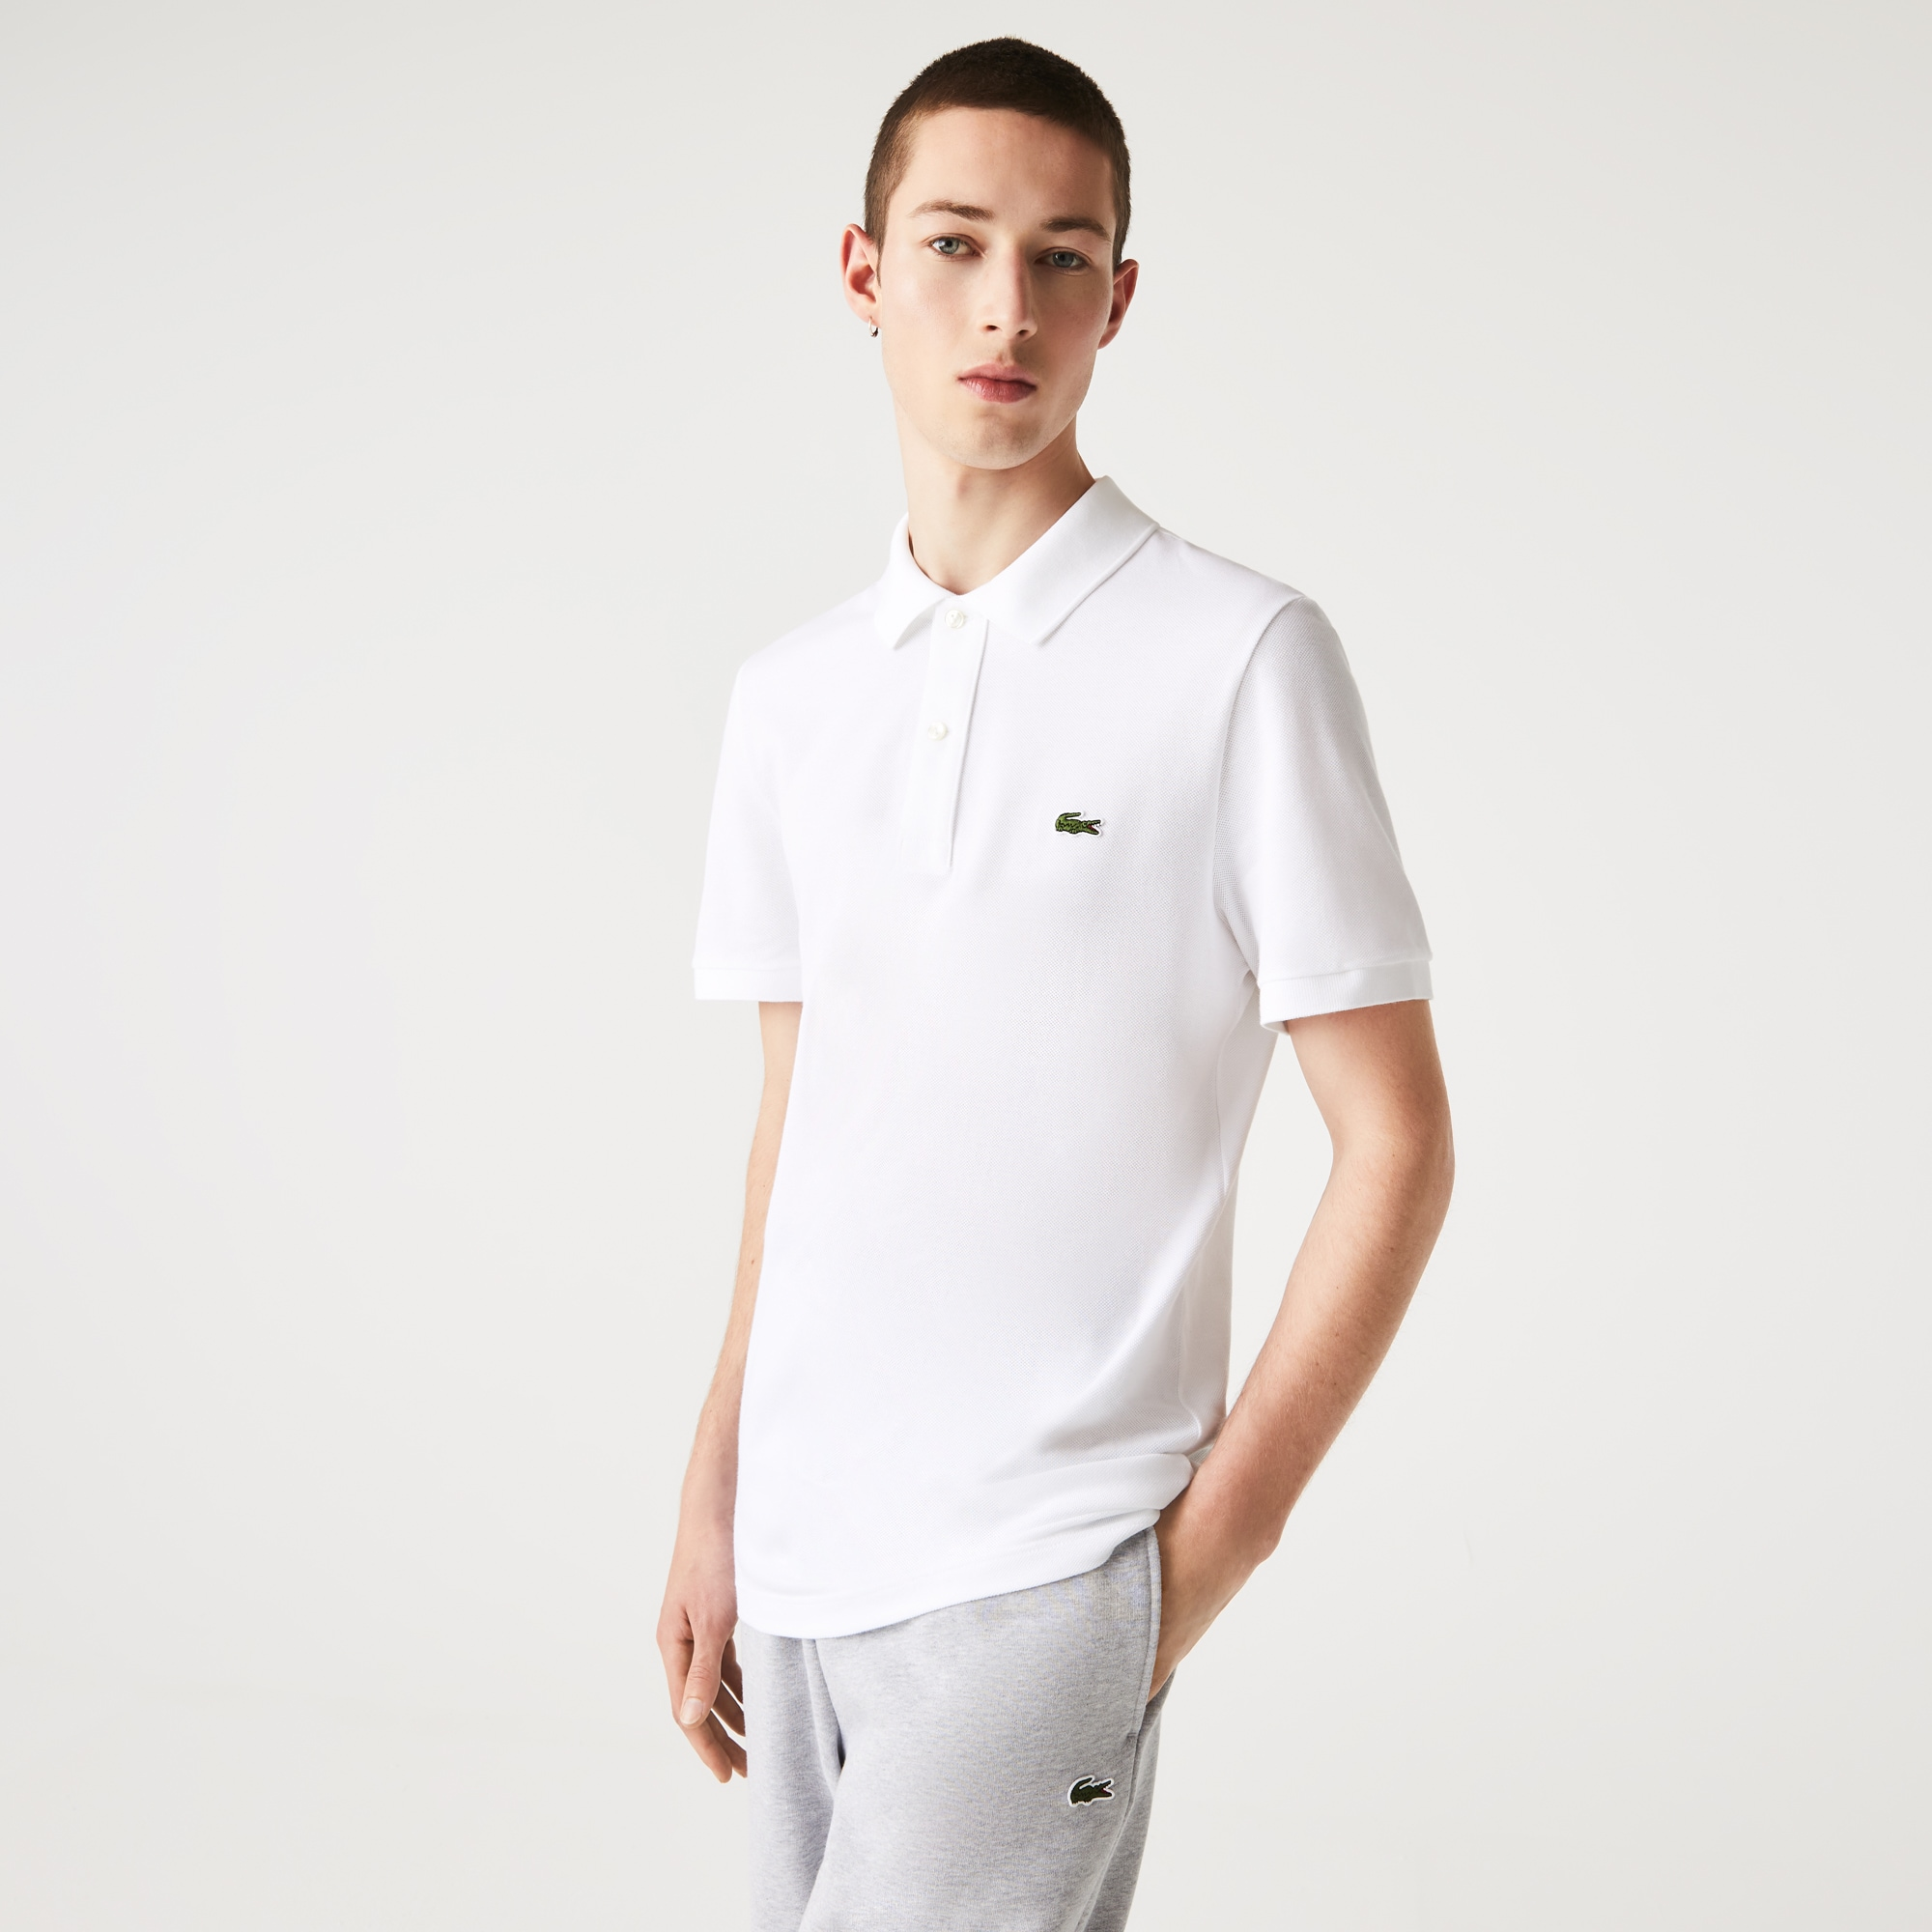 Camisa Polo Lacoste Slim Fit Masculina em Petit Piqué